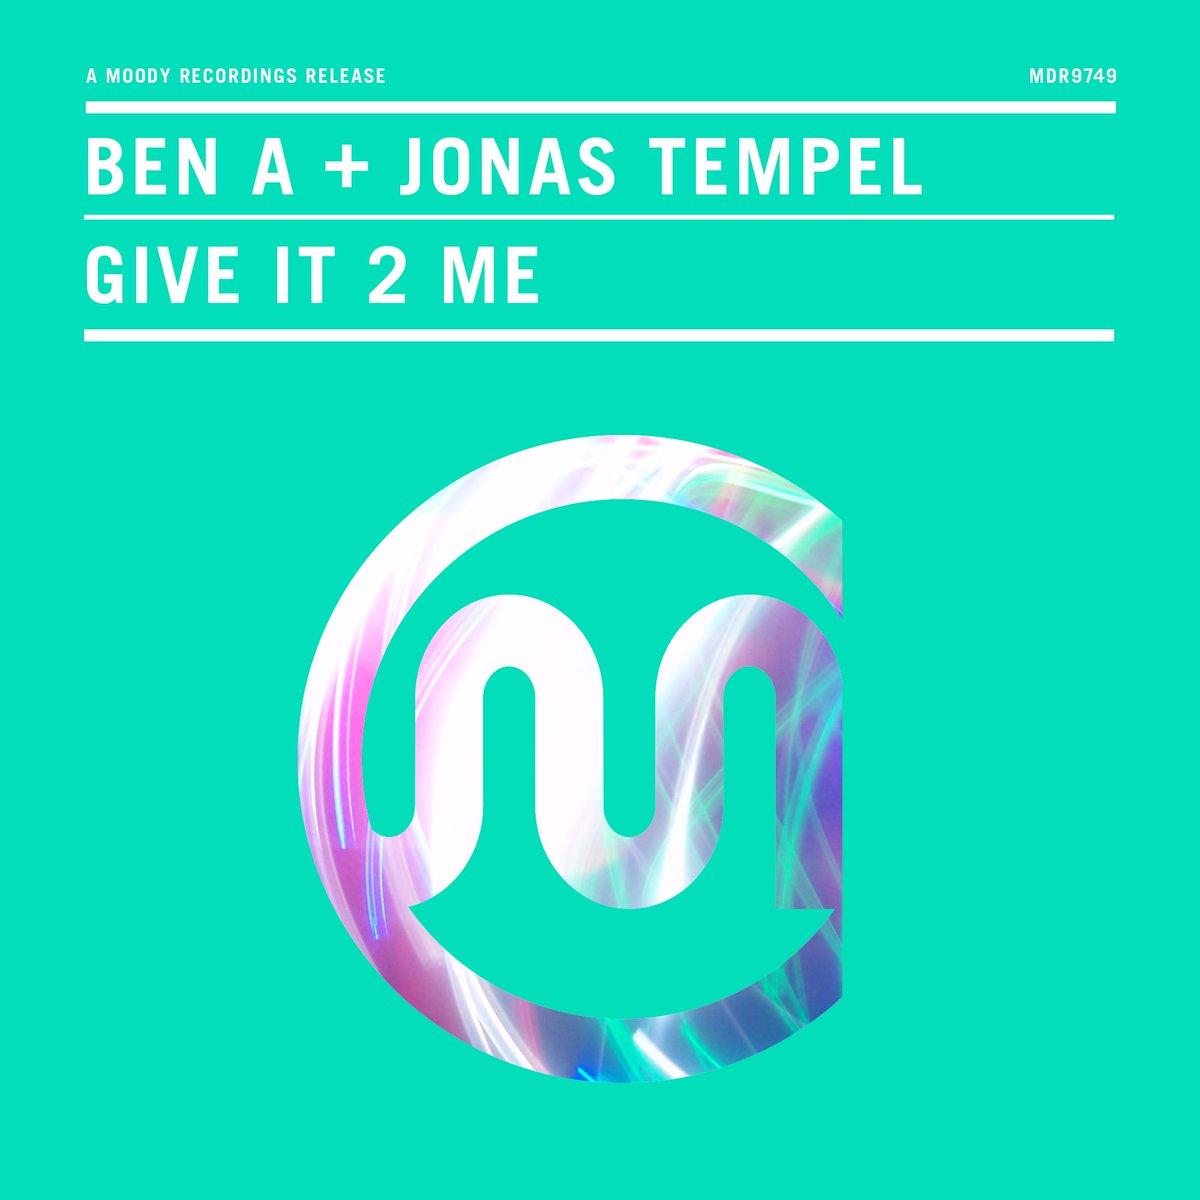 Give It 2 Me' exclusively on @beatport next Monday from @JonasTempel and @Ben_A_music !  #beatport #techhouse #techhousenation #Denver #NewMusicAlertpic.twitter.com/NV7BKQQOaW